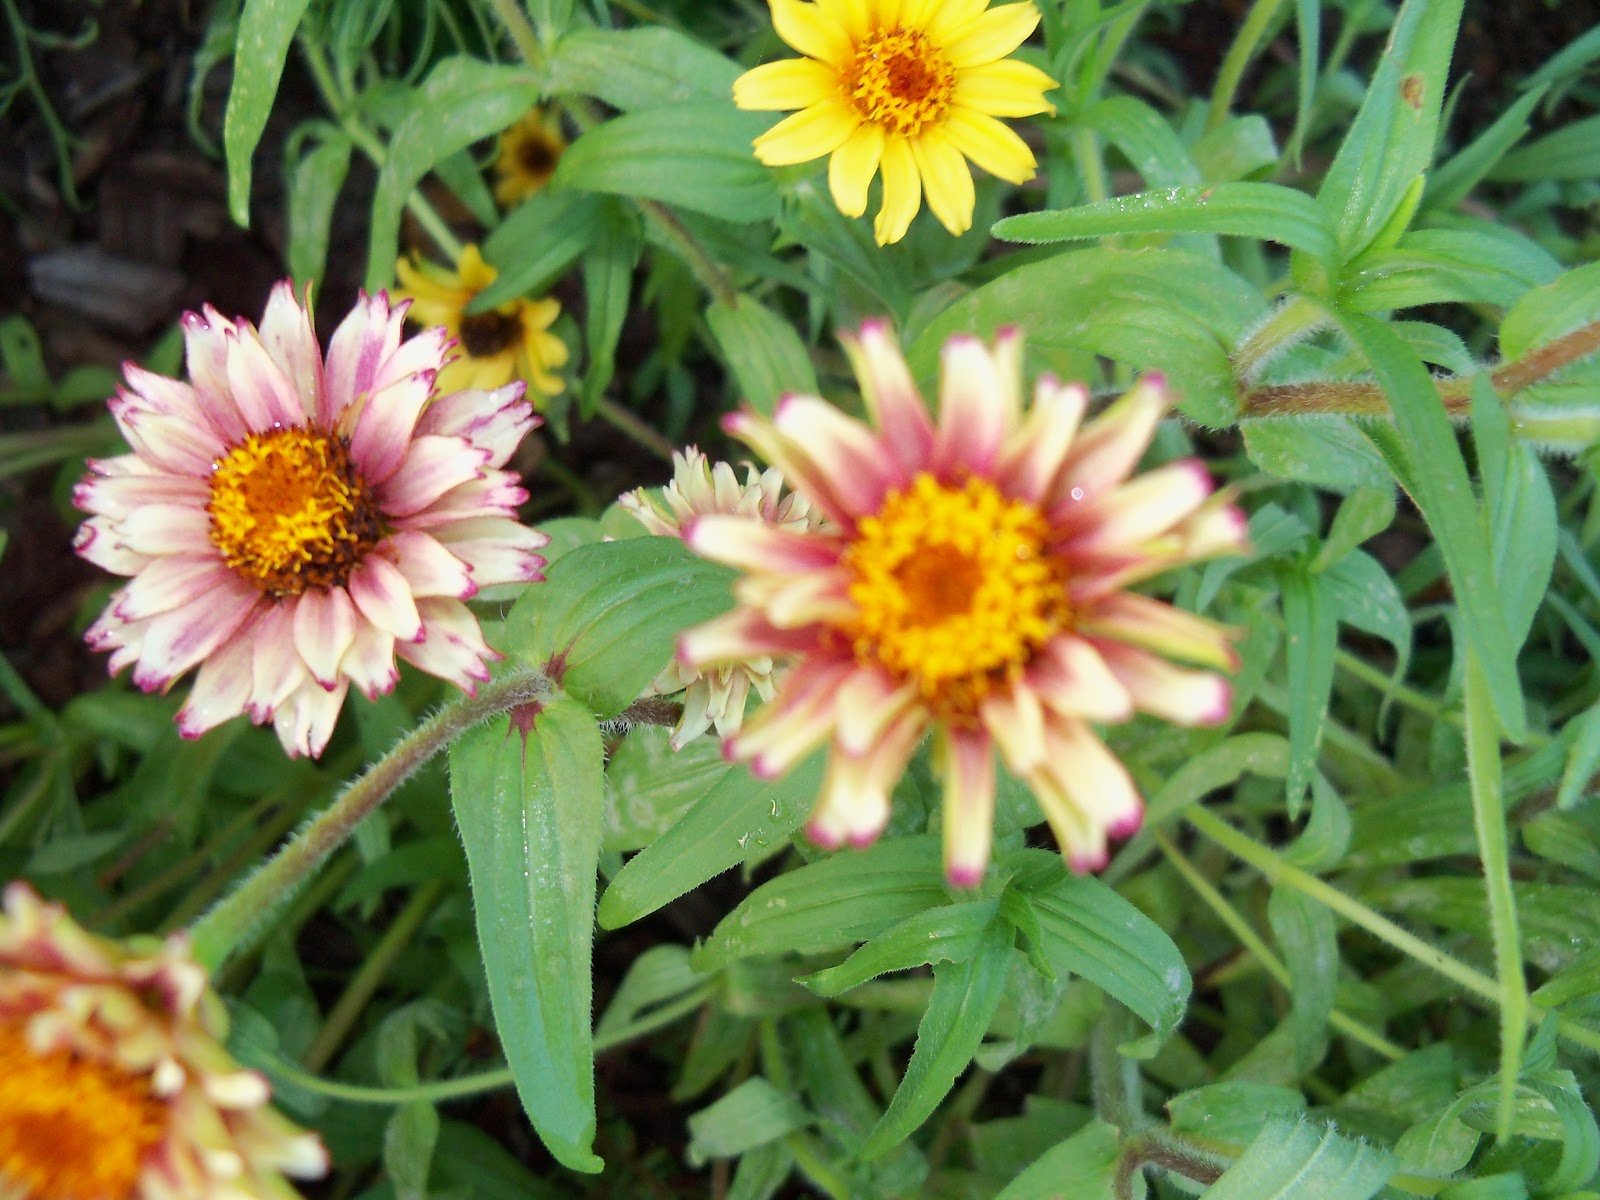 Gardening 2010, Part Three - 101_3981.JPG